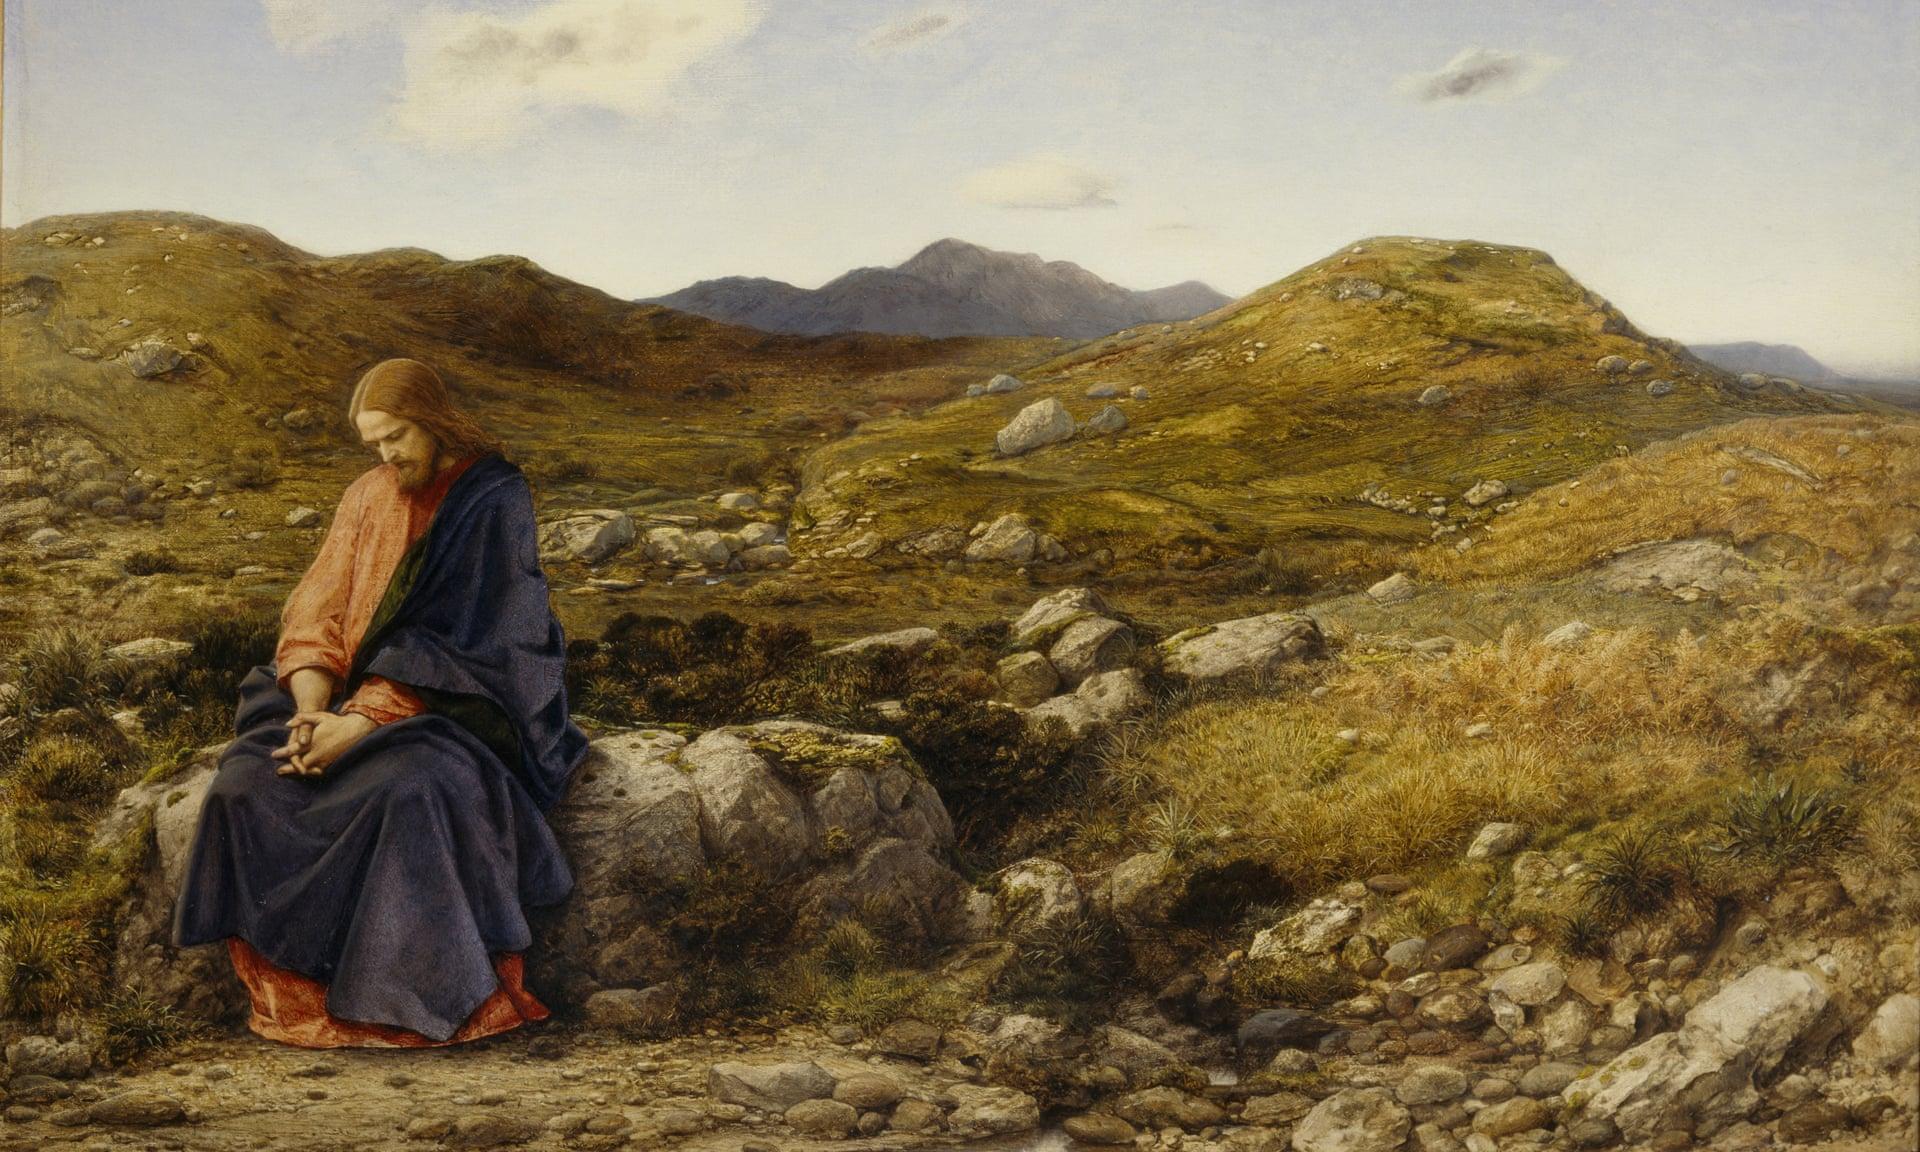 Christ man of sorrows